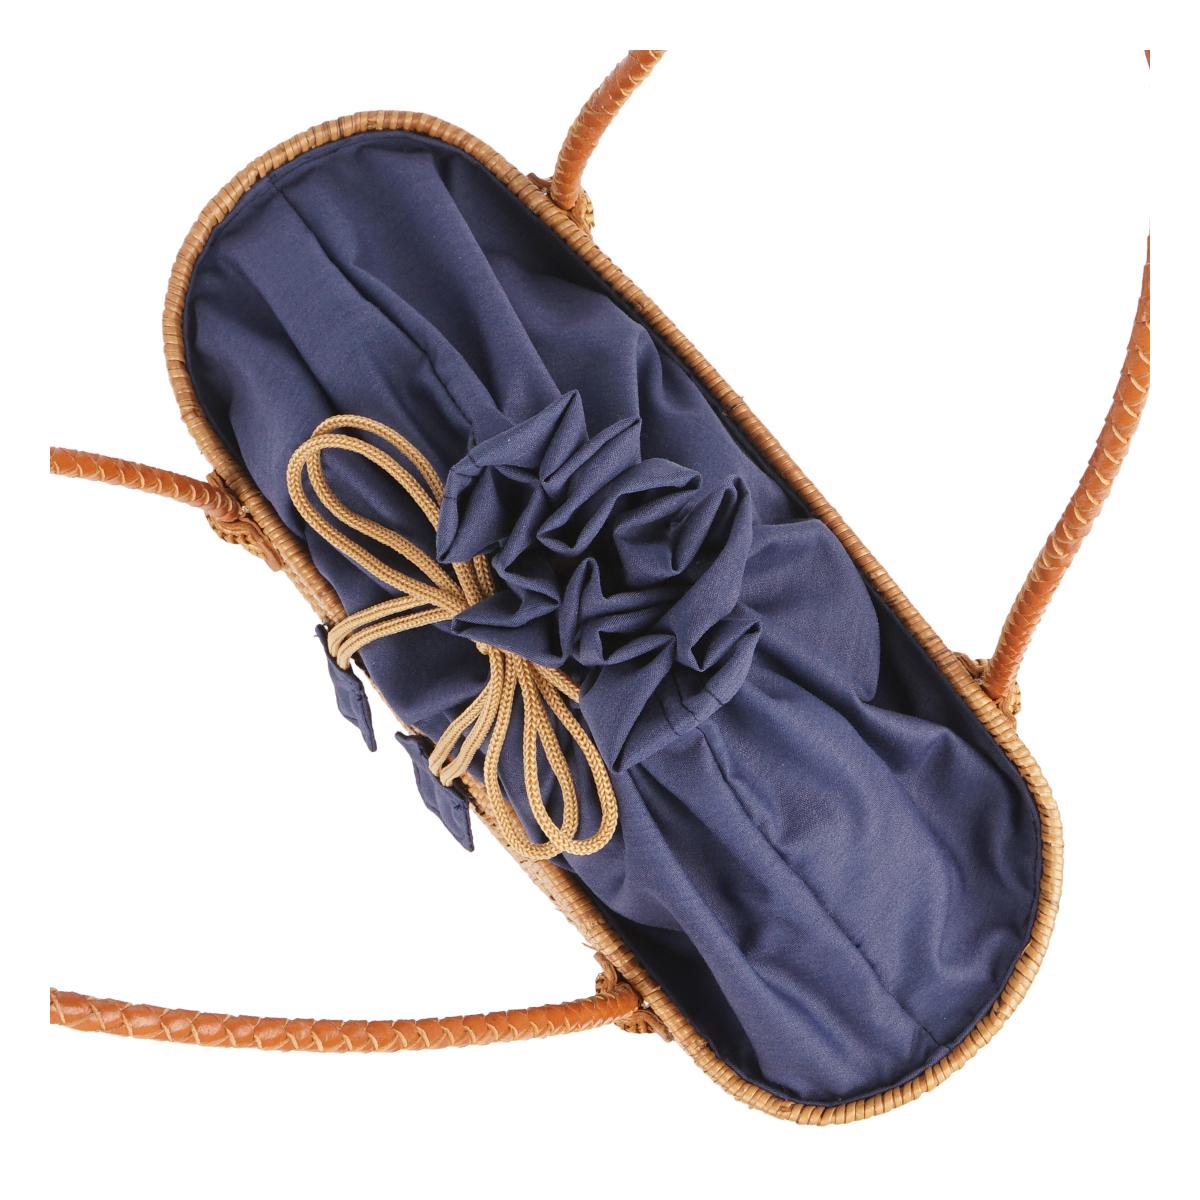 【30%OFF】【ATA BAG】 La Cute オリジナルテキスタイル かごトートバッグ スクエアタイプ LAAT002 (ネイビー)